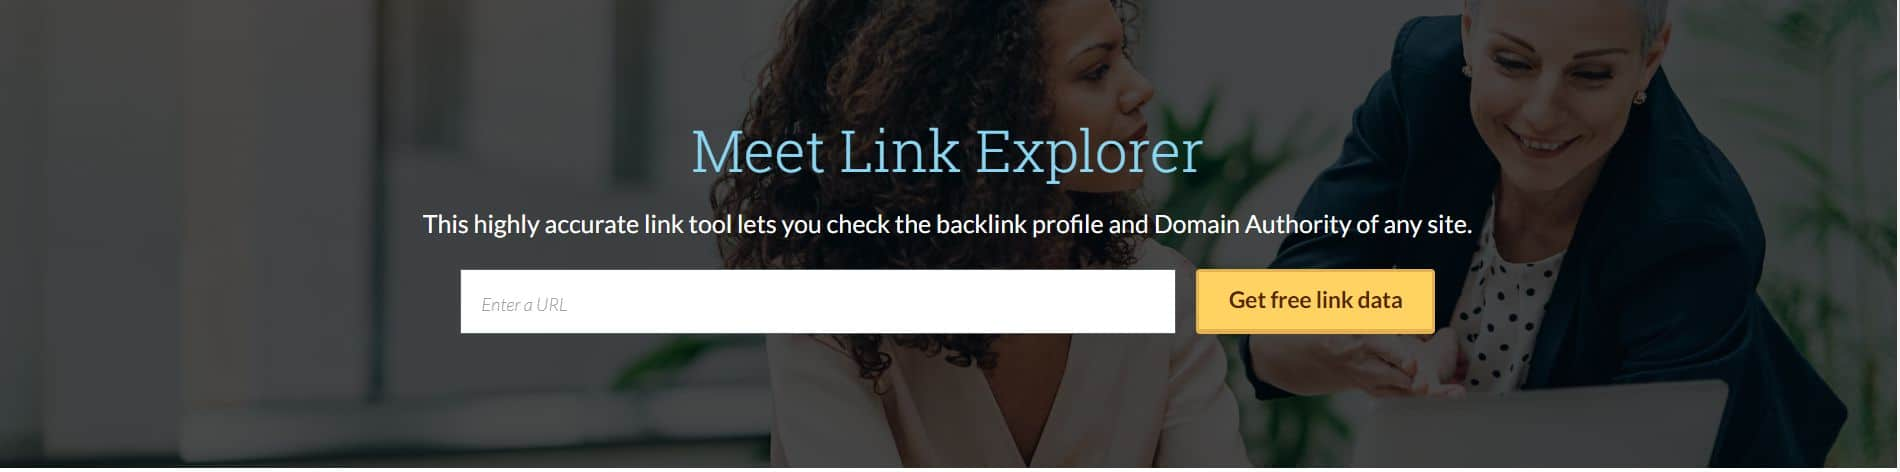 Kiểm tra DA của website bằng MOZ